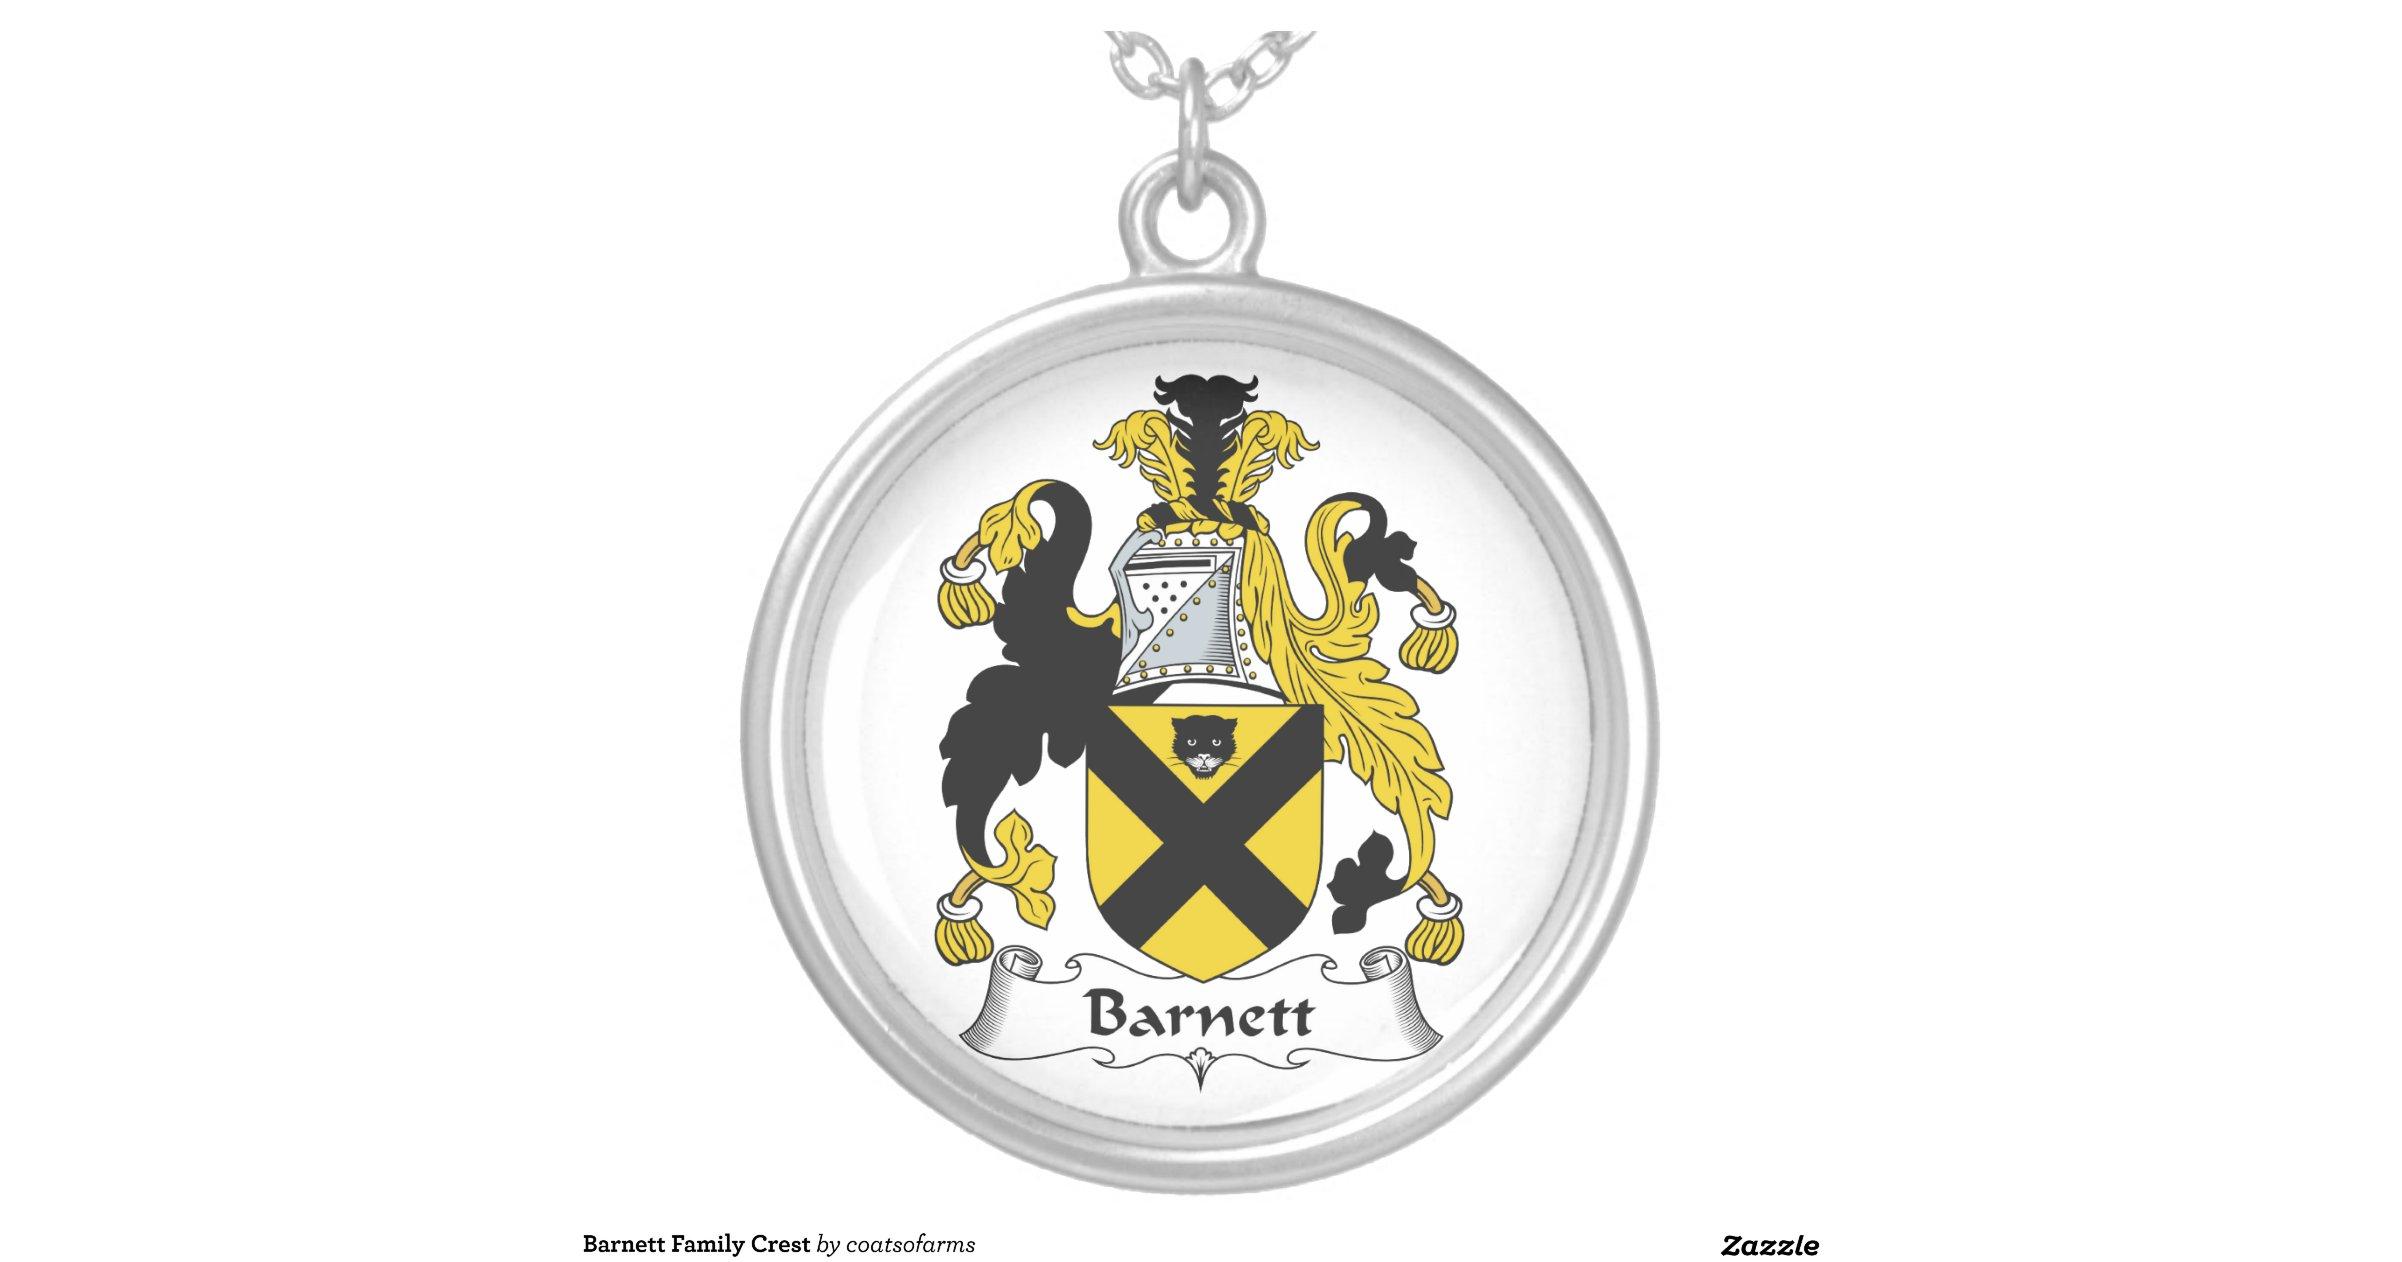 barnett family crest pendant necklace zazzle